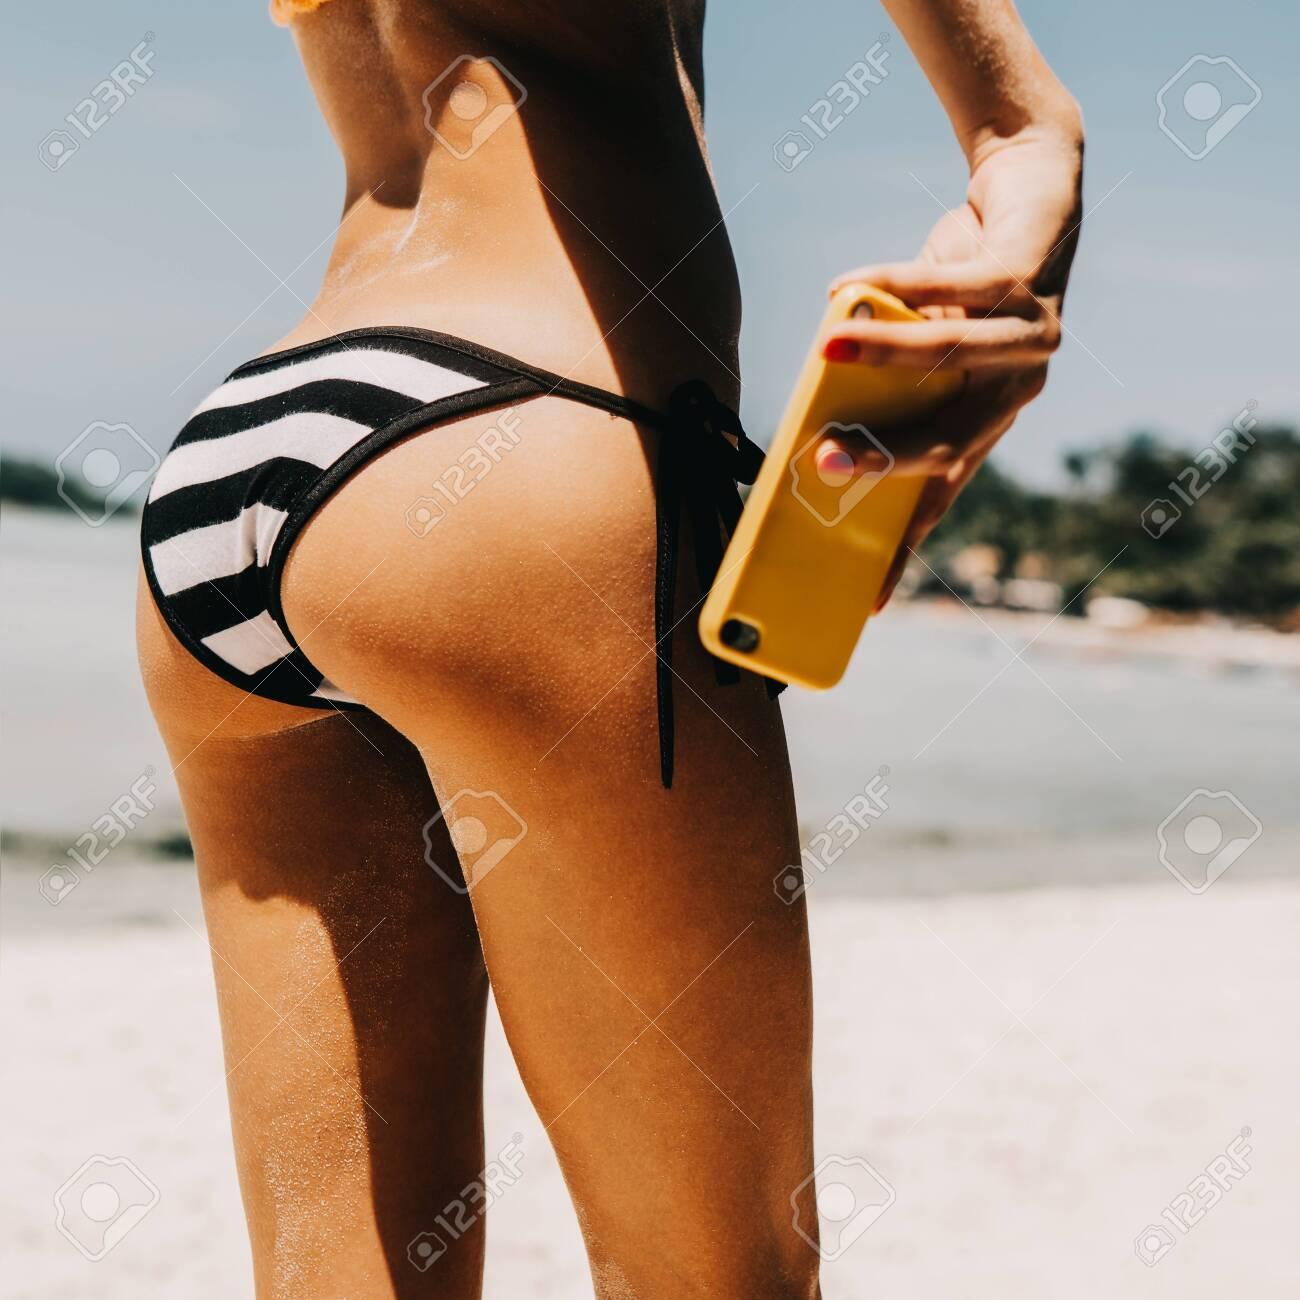 Anna kendrick pussy nude